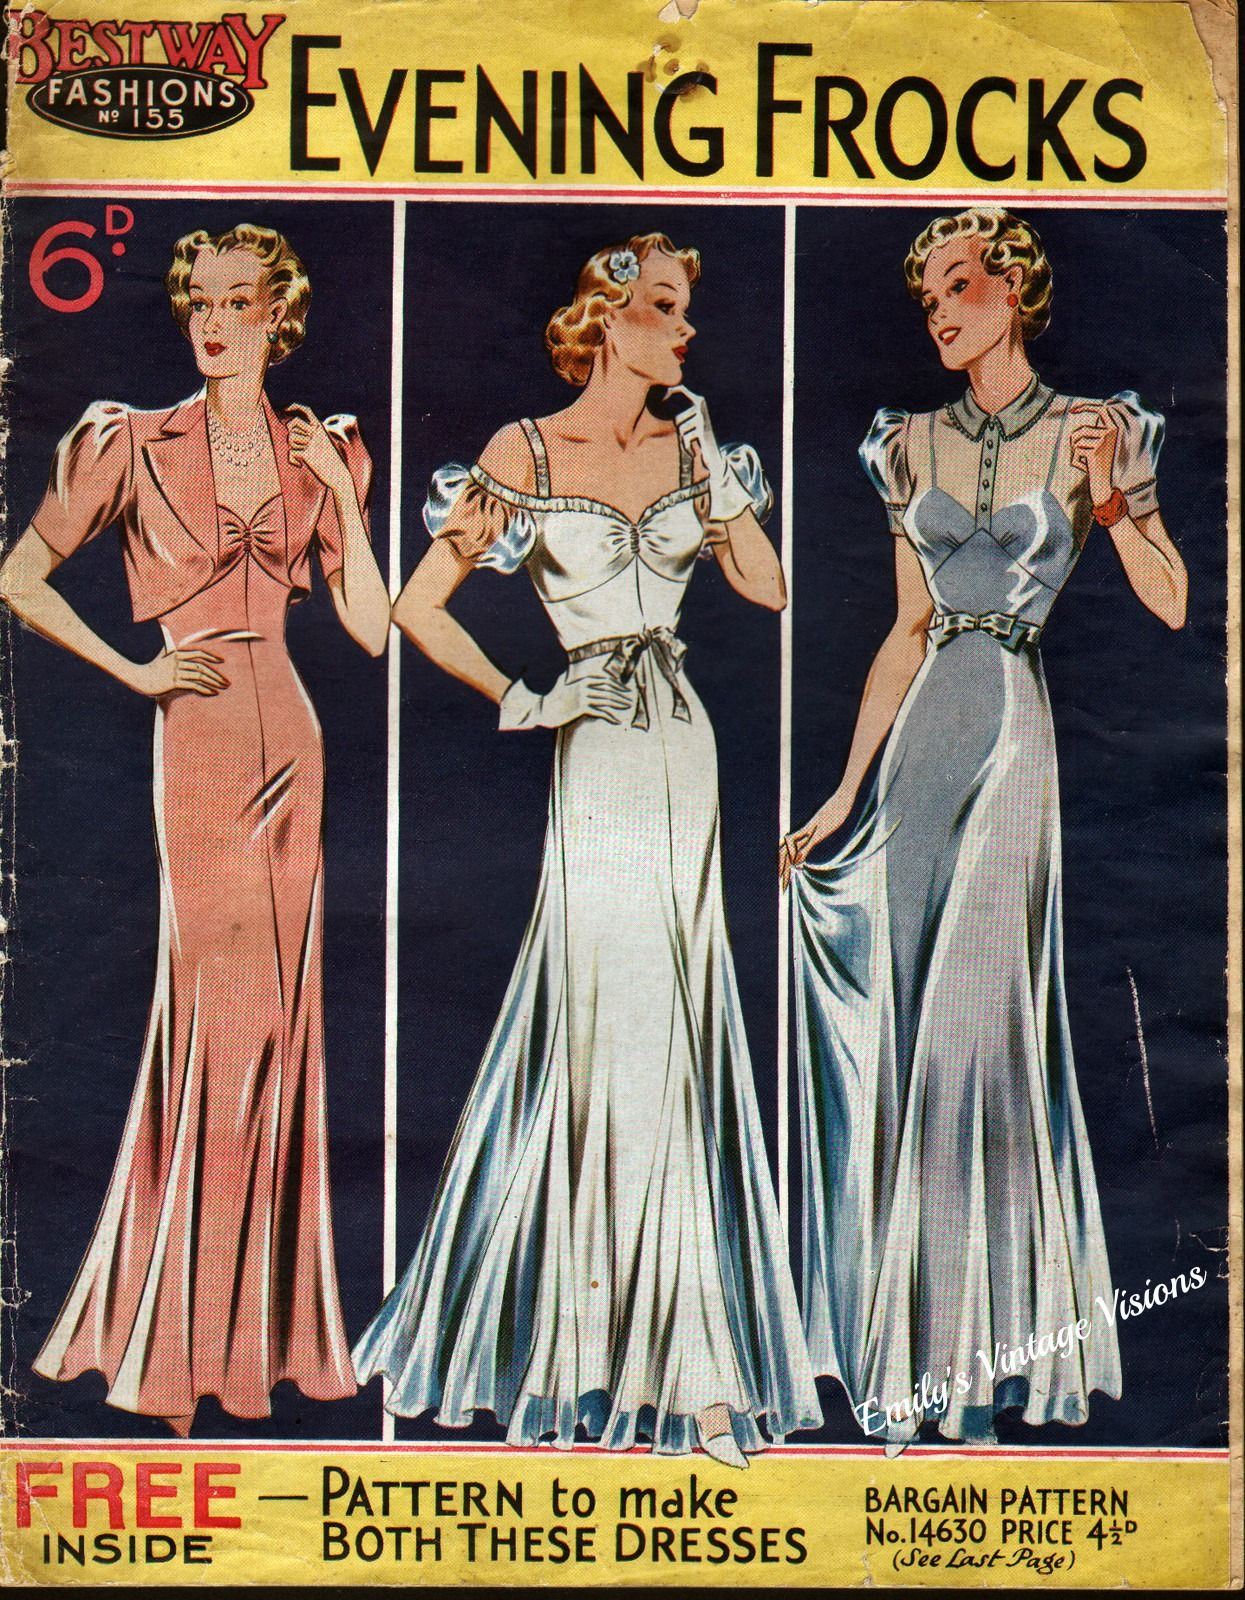 1930s vintage evening dress patterns | 1930s bestway fashions pattern catalog for evening gowns 1930s bestway